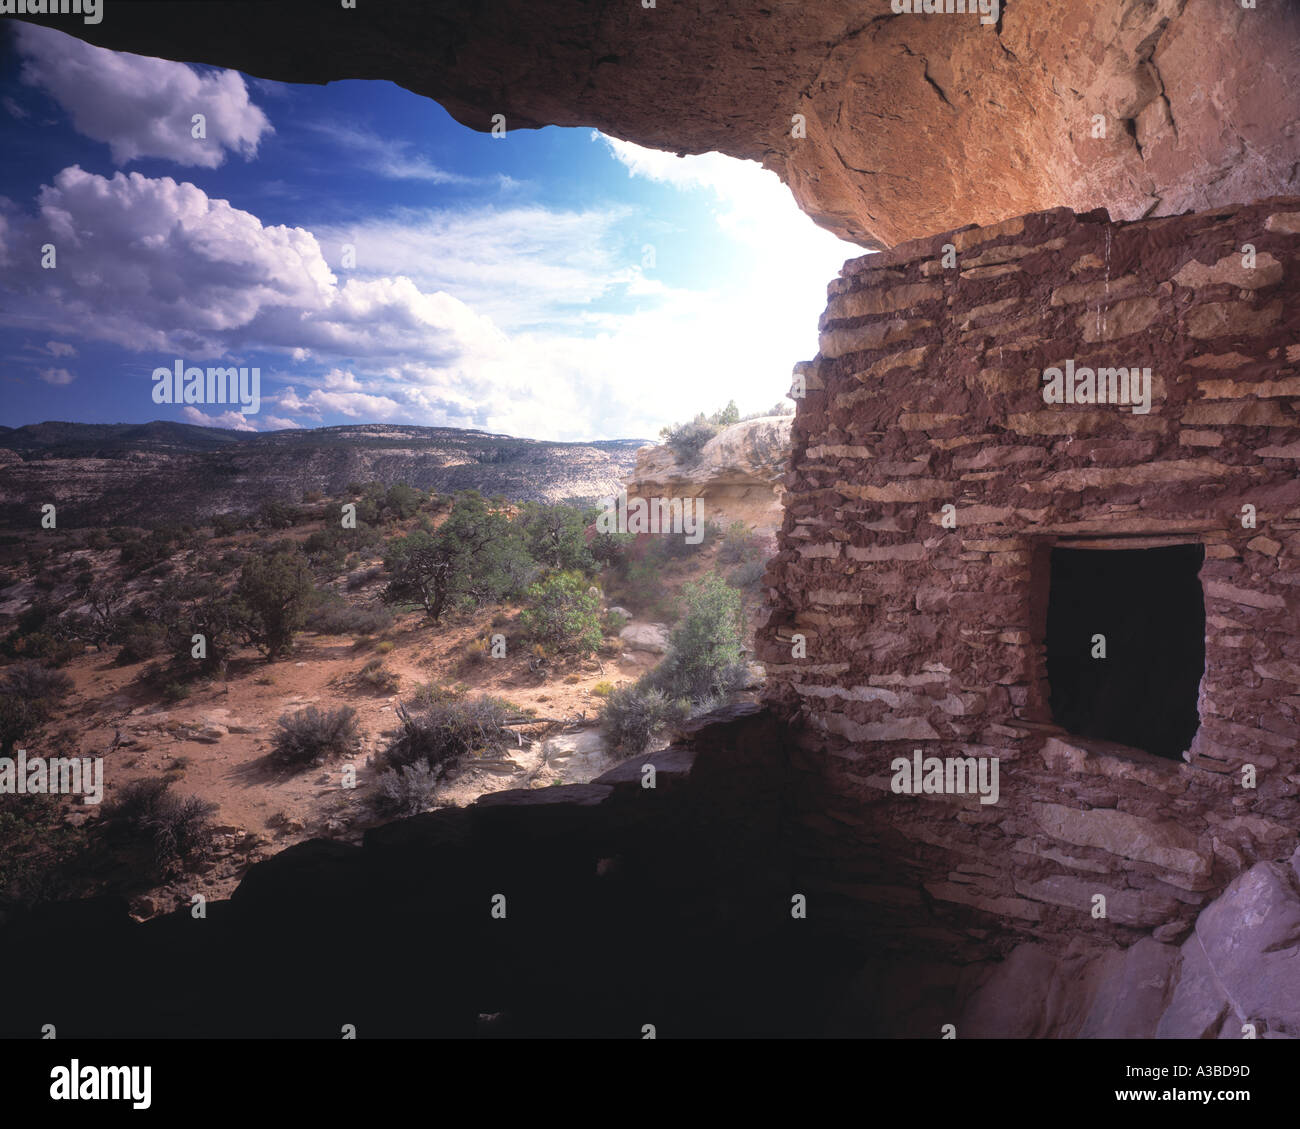 Anasazi Cliff Dwelling Southern Utah Stock Photo